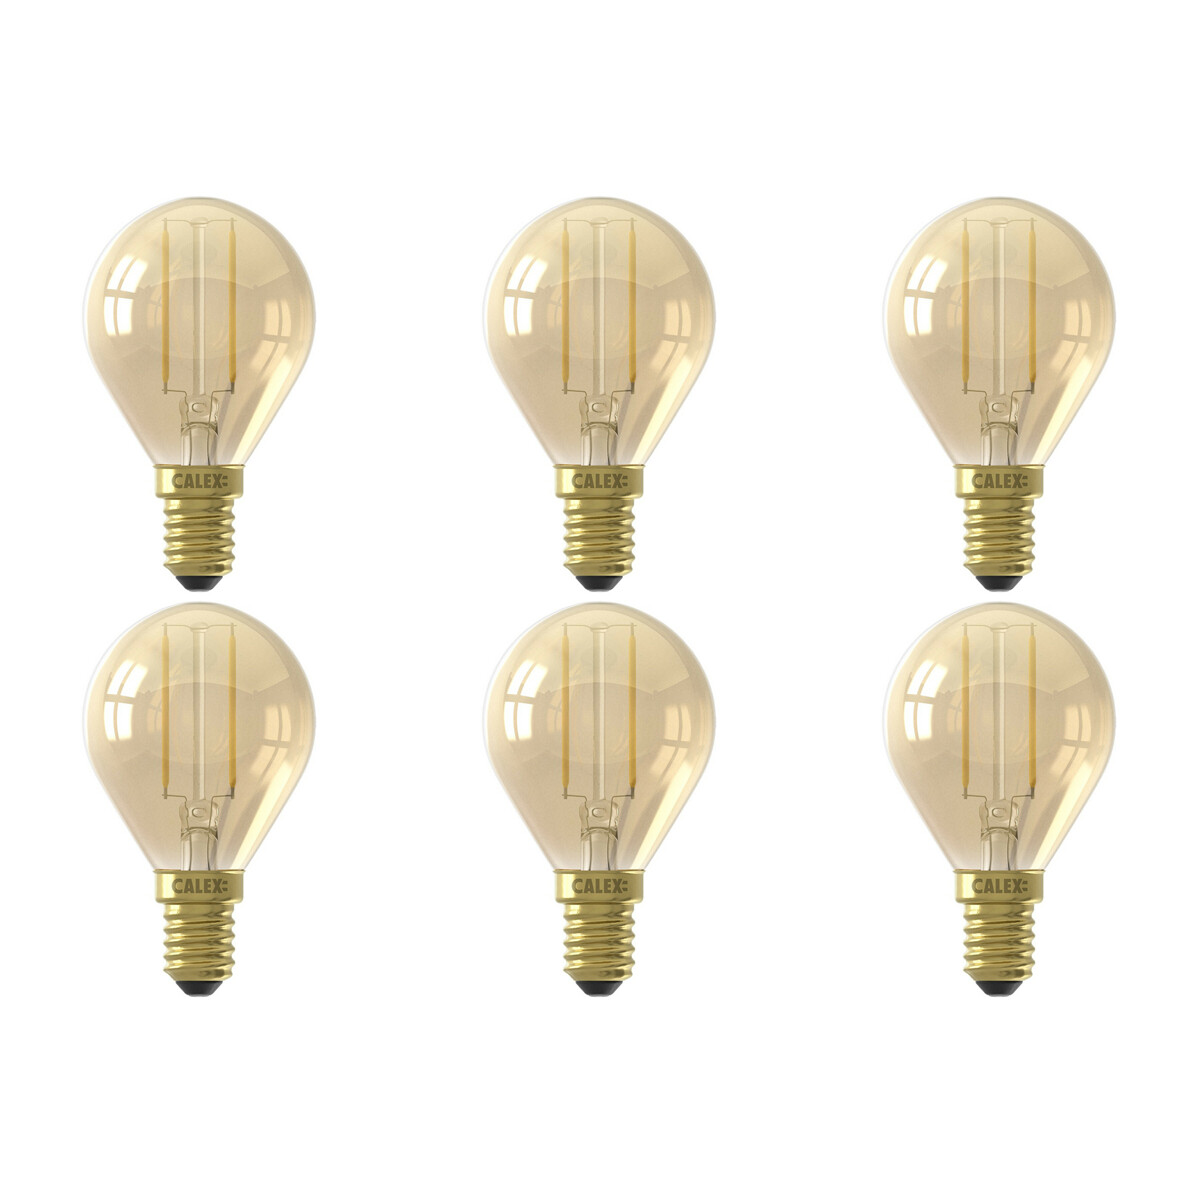 CALEX - LED Lamp 6 Pack - Kogellamp P45 - E14 Fitting - 2W - Warm Wit 2100K - Goud